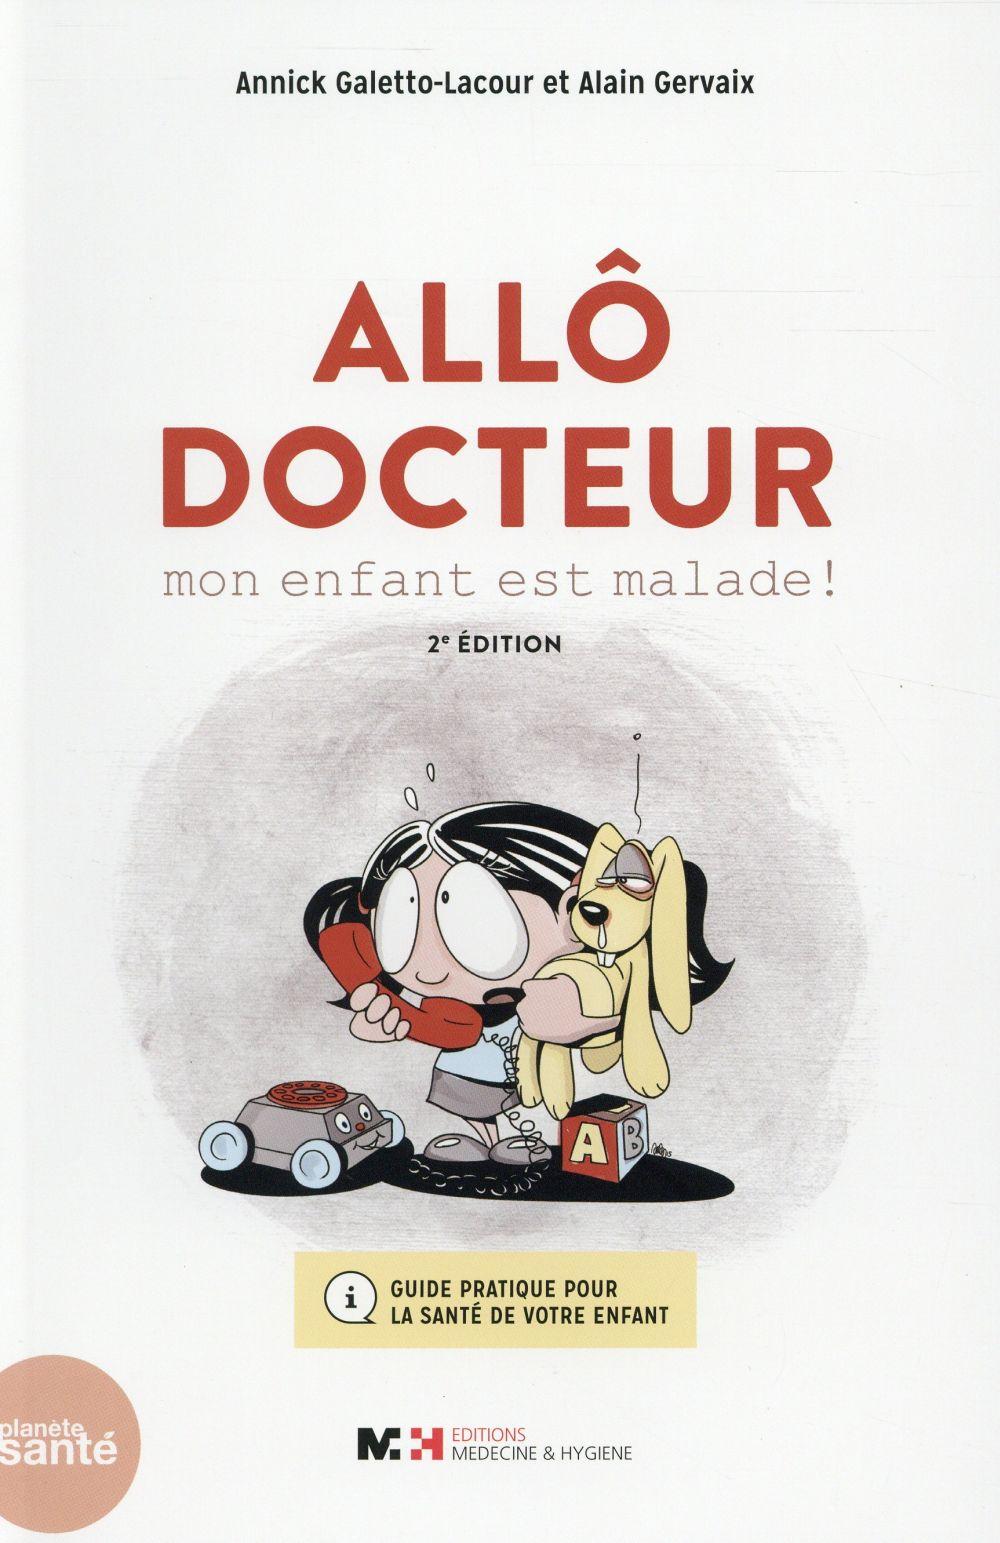 Allo docteur mon enfant est malade, 2e ed